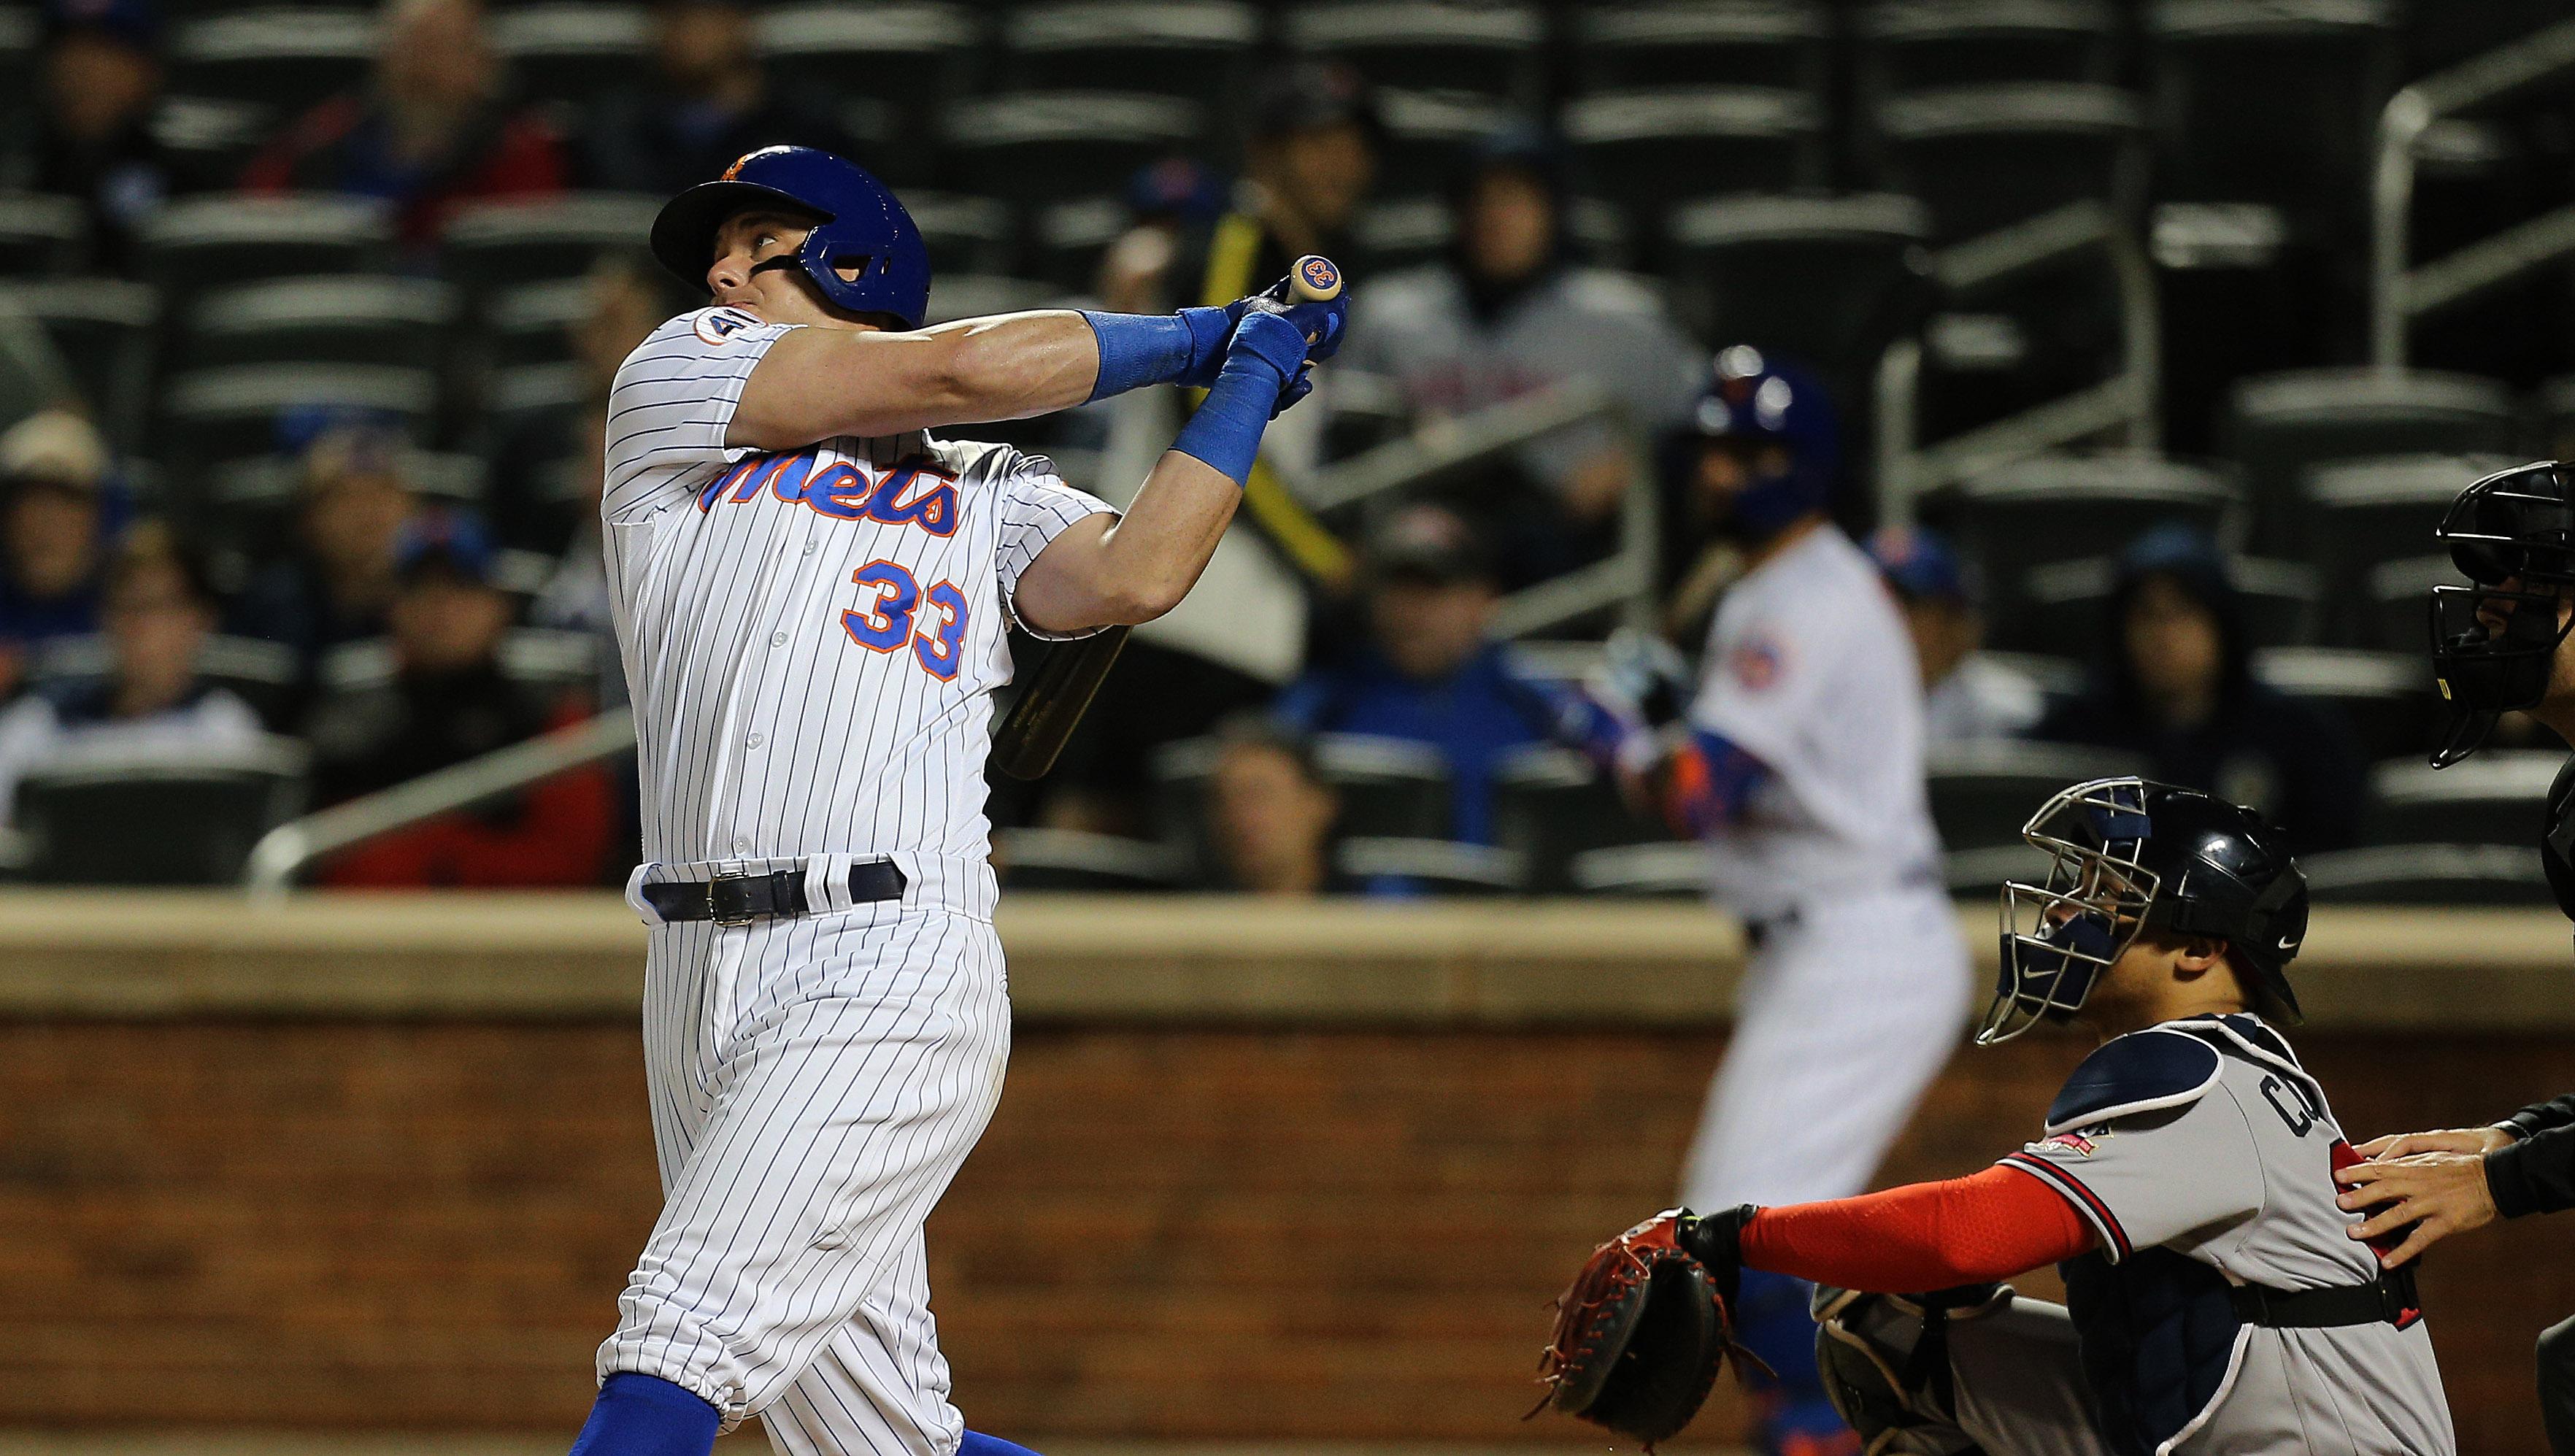 6/23/21 Game Preview: Atlanta Braves at New York Mets